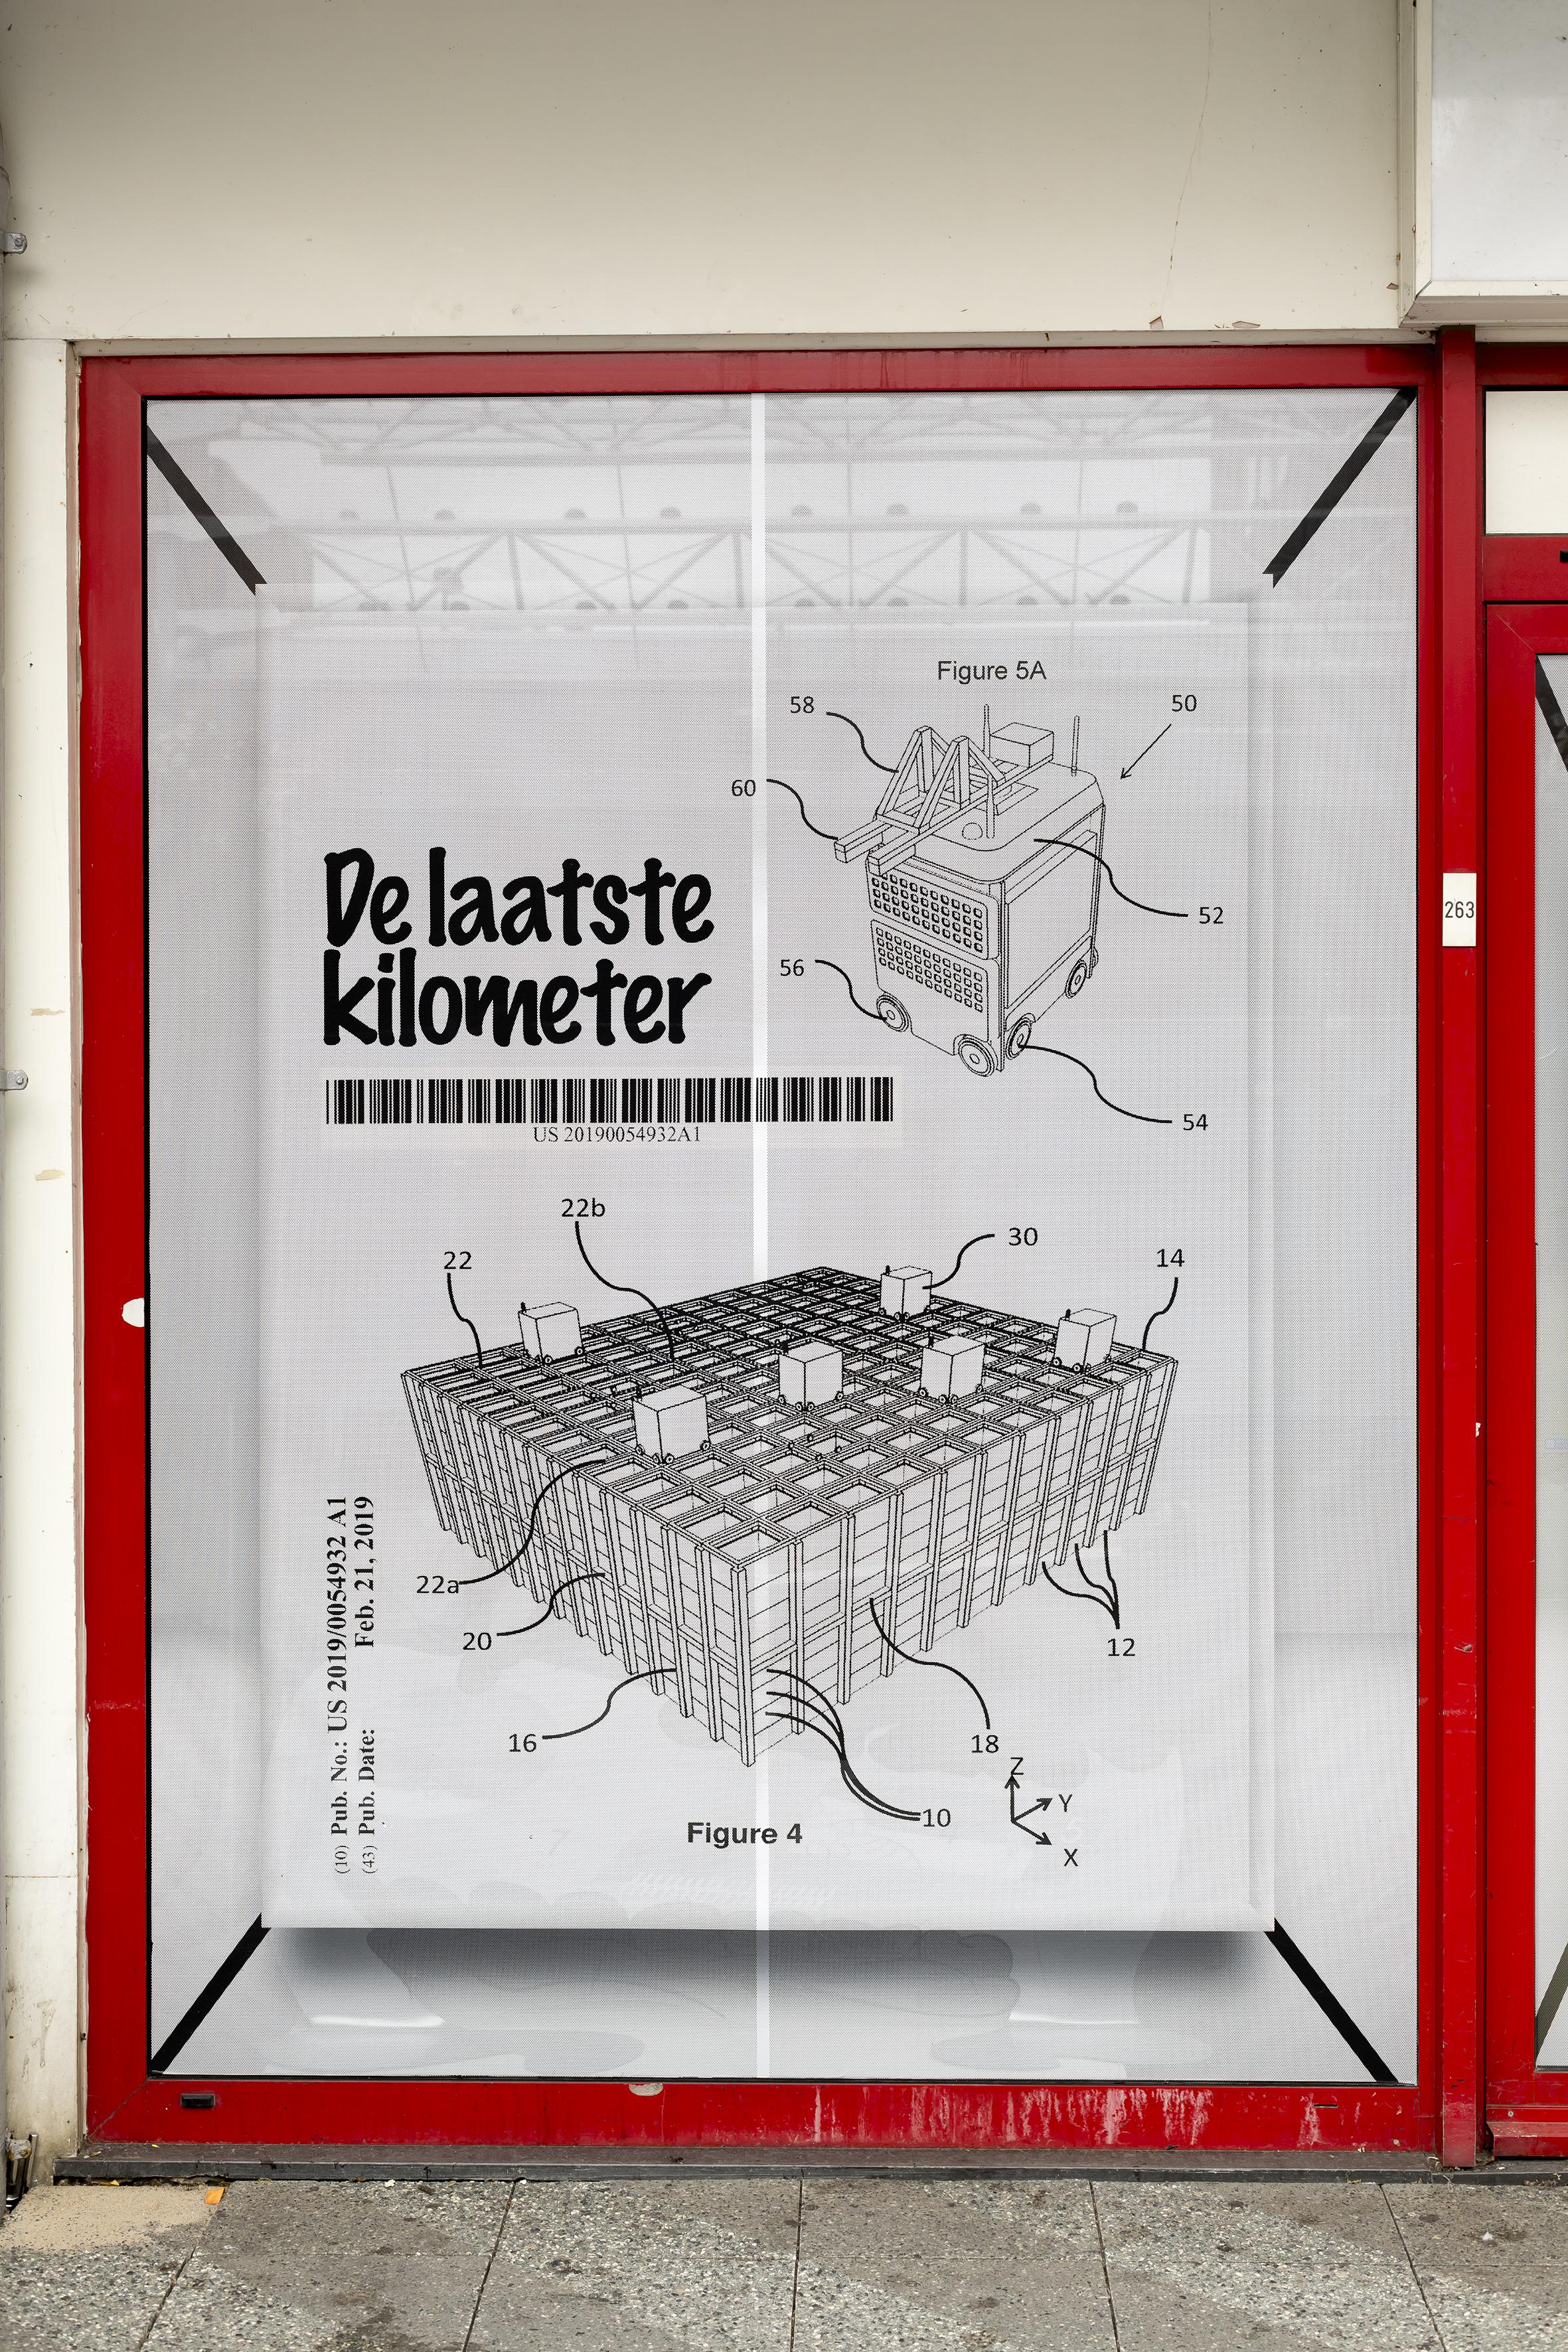 TheLastMile_FemkeHerregraven_KunsthalleAmsterdam_10